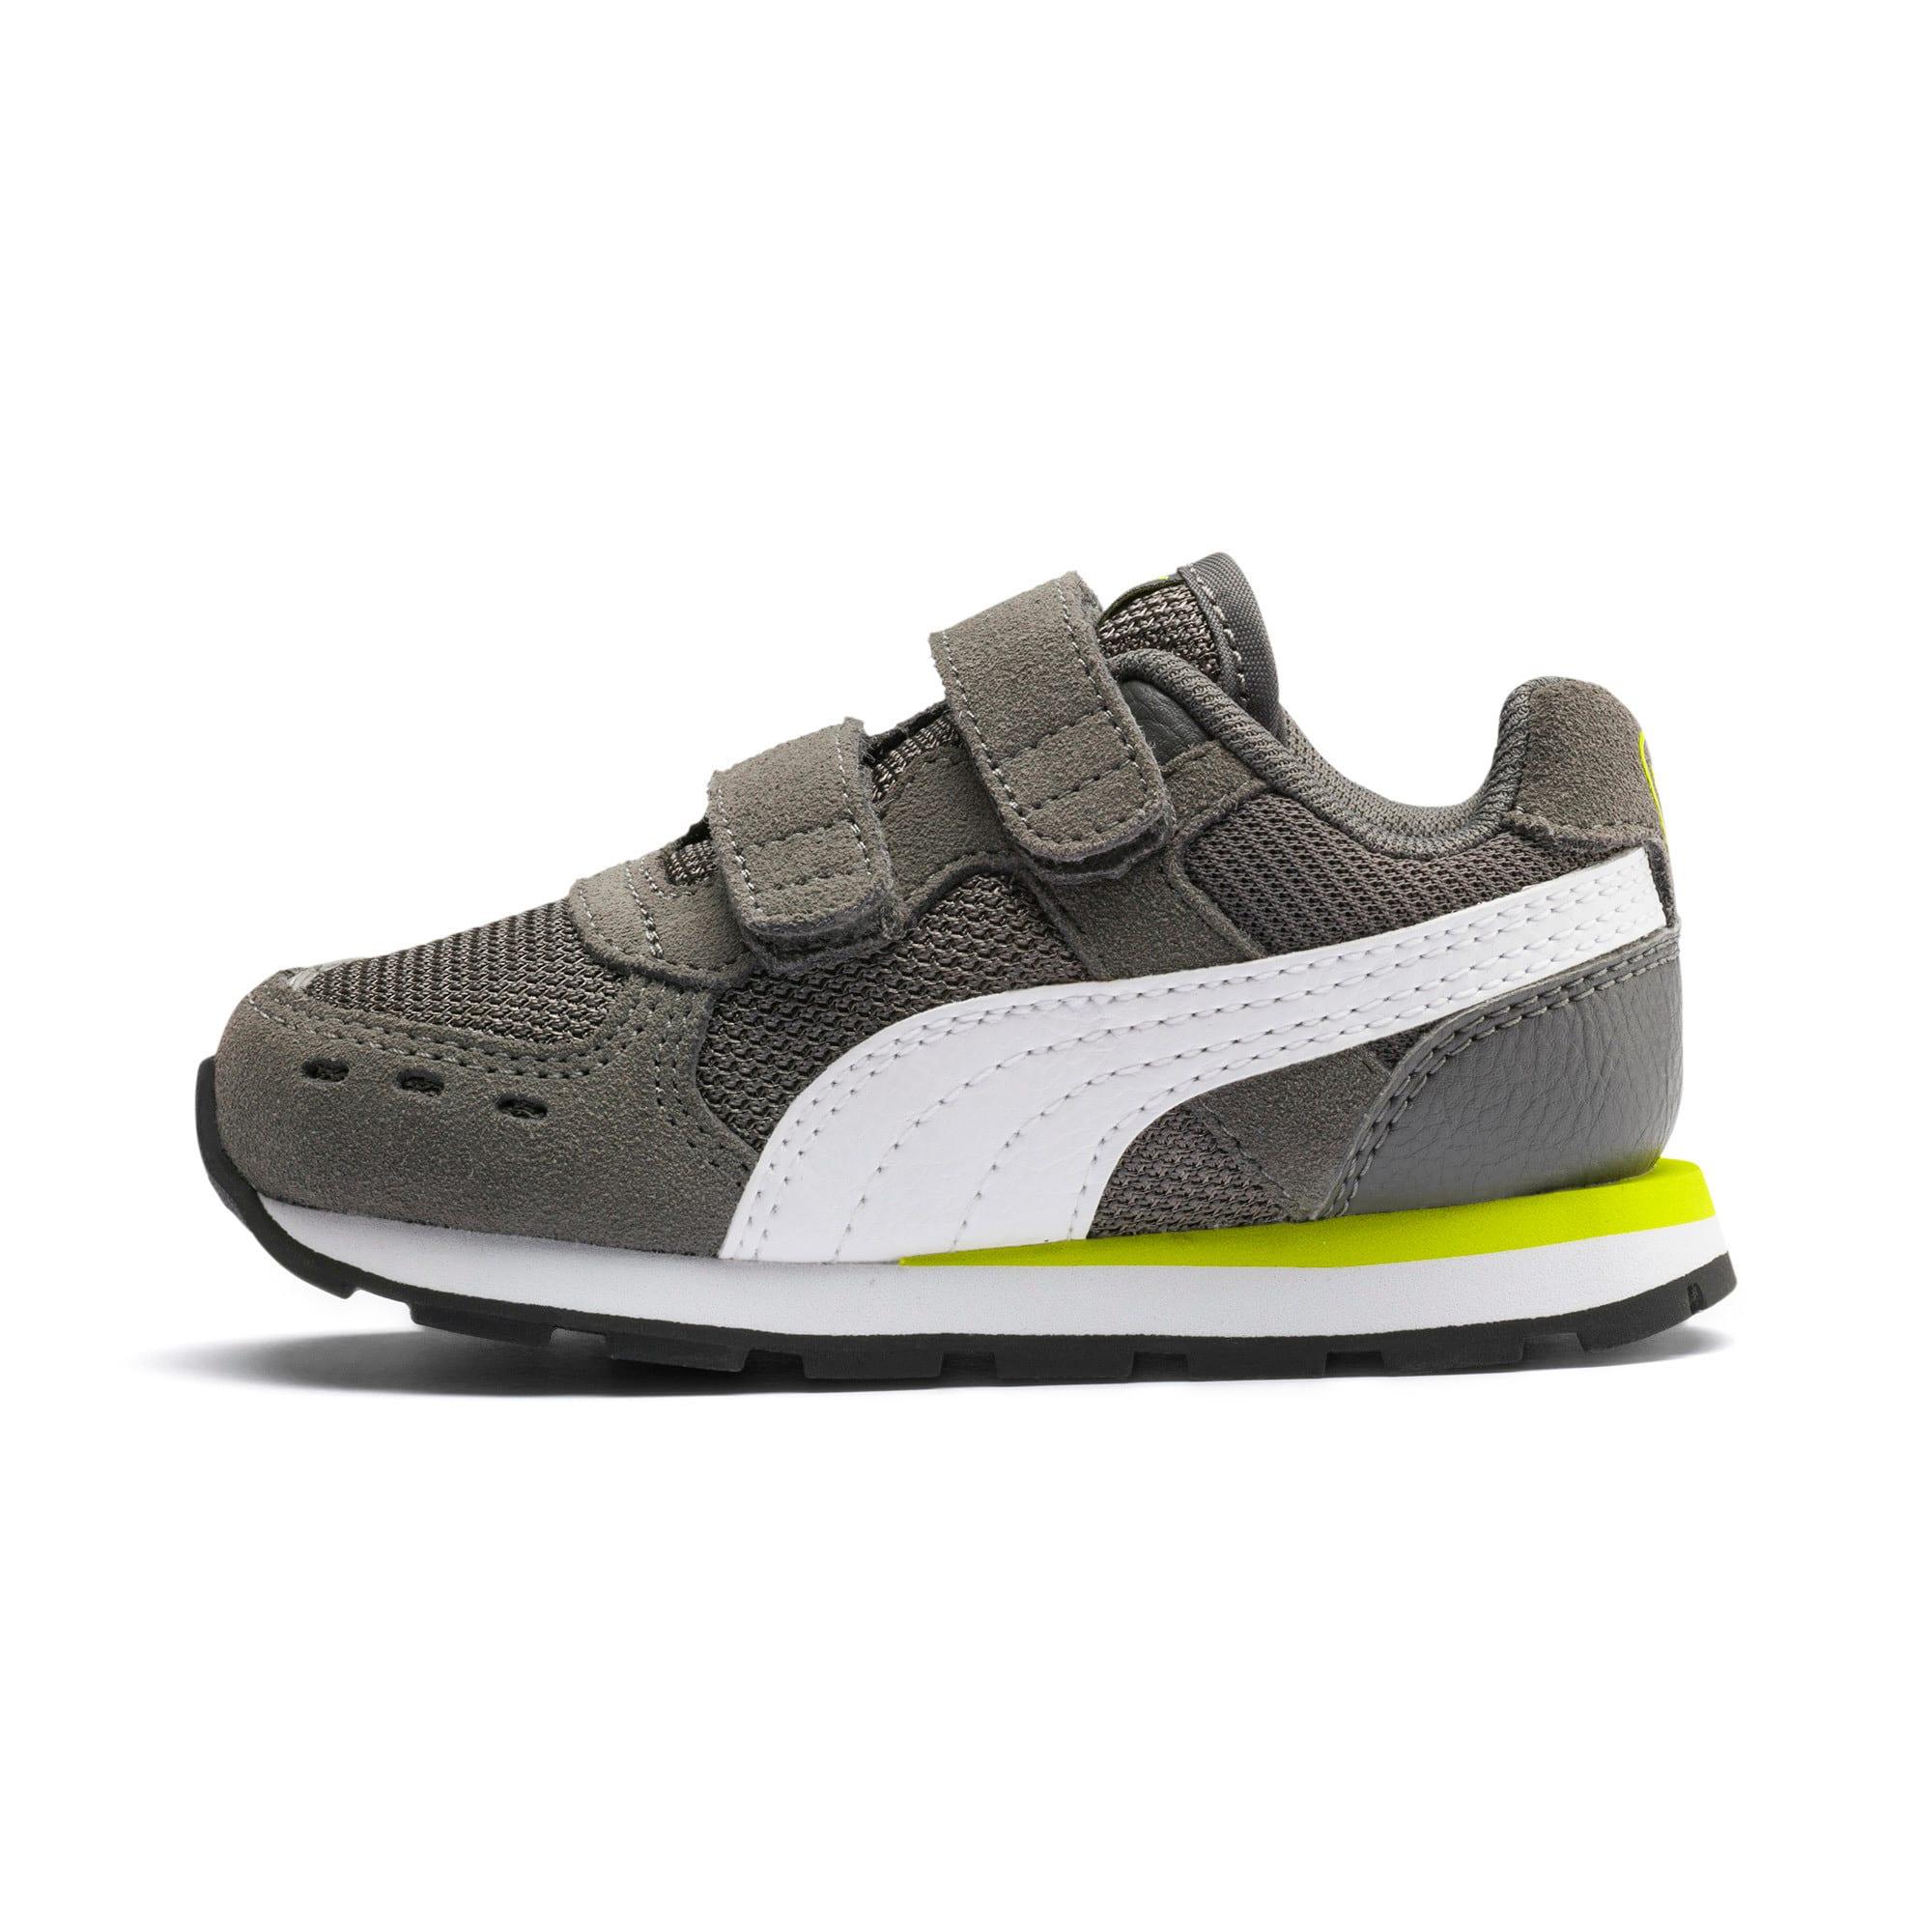 Miniatura 1 de Zapatos Vista para bebé, CASTLEROCK-Puma White, mediano